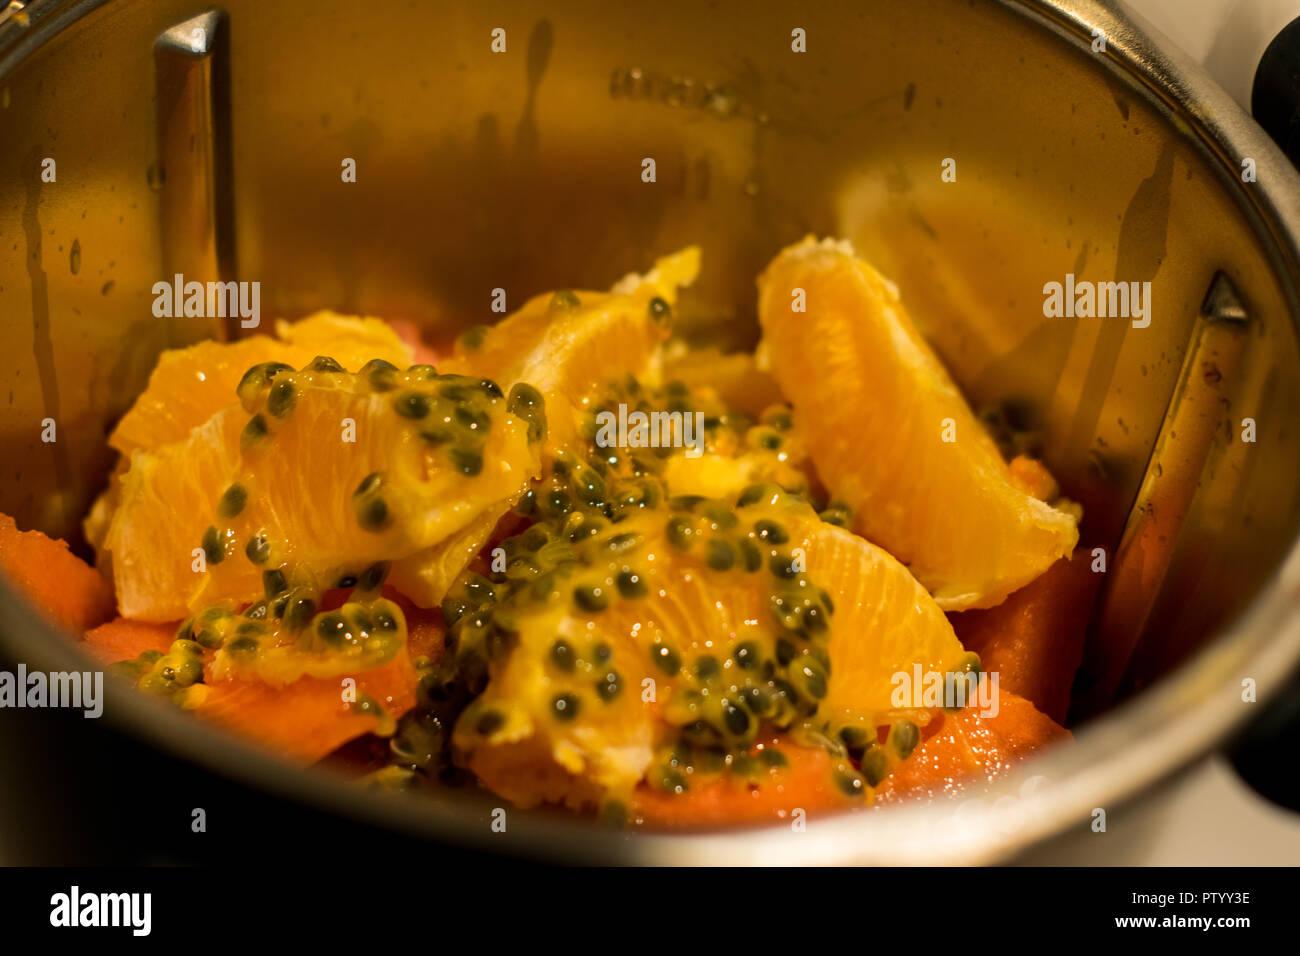 Vorwerk Bimby kochen Stockfoto, Bild: 221890130 - Alamy